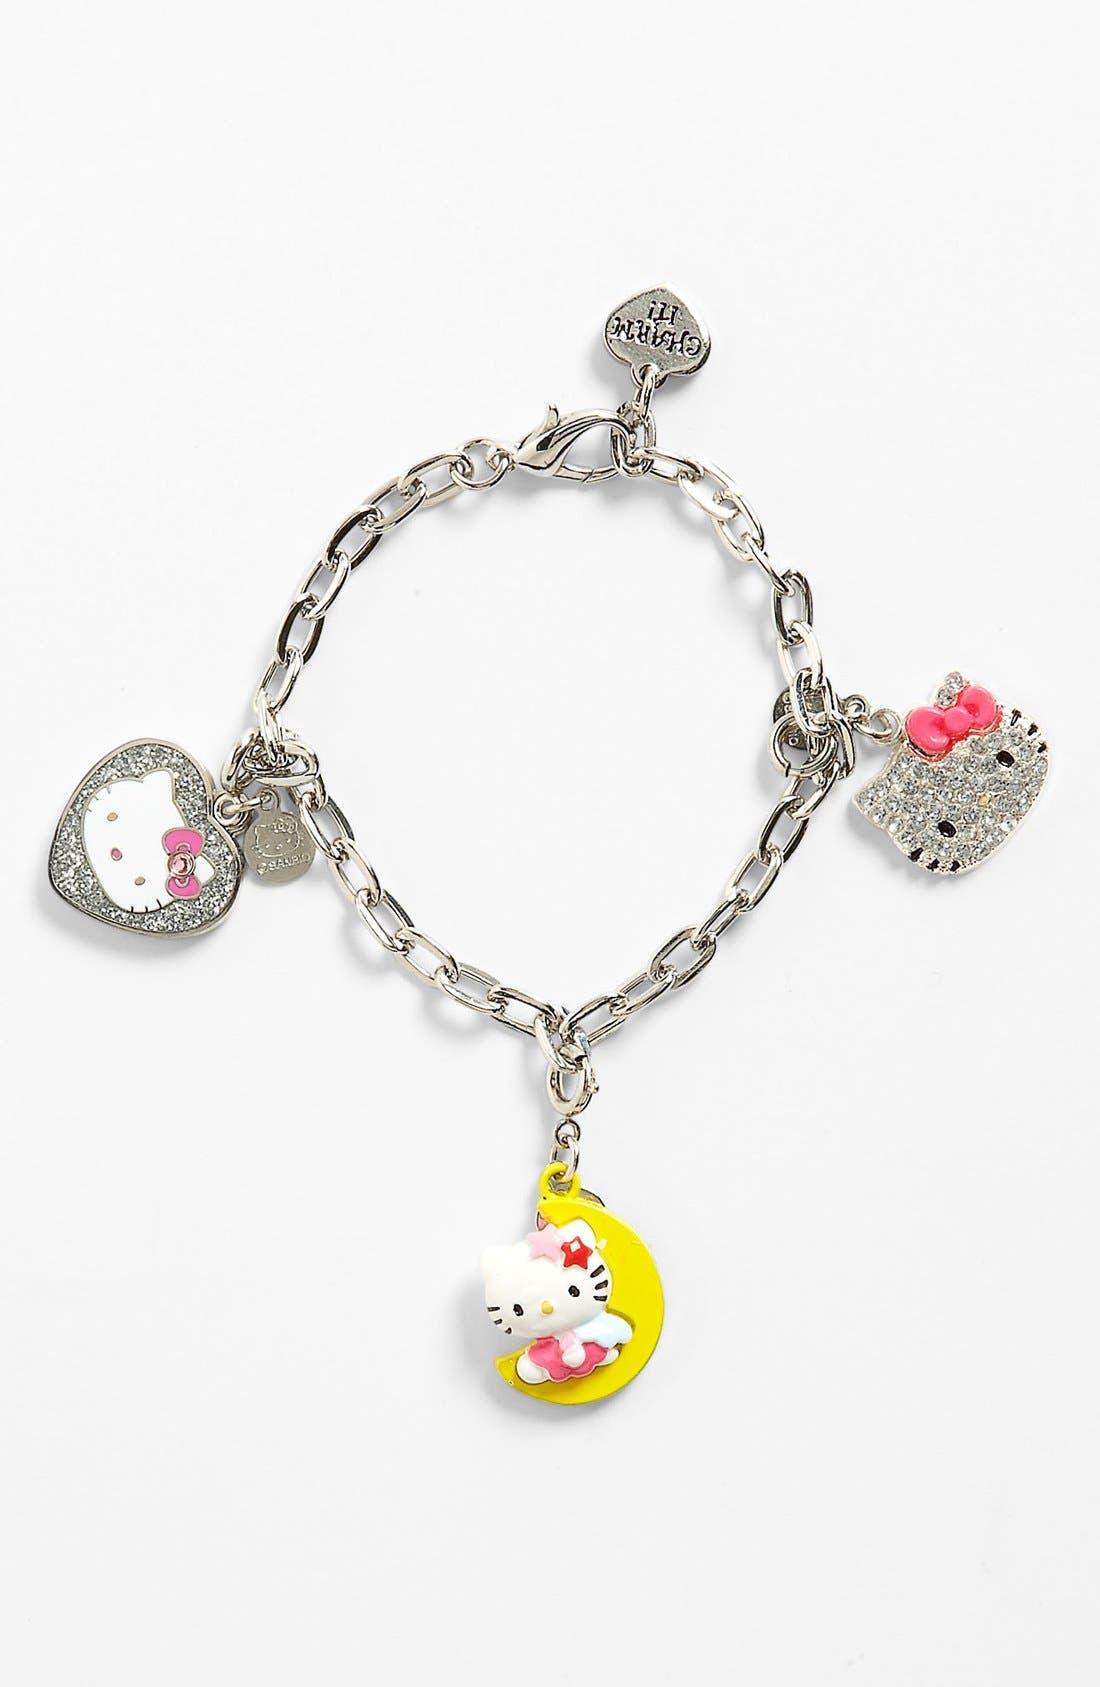 Main Image - CHARM IT!® 'Hello Kitty®' Charm Bracelet Gift Set (Girls)